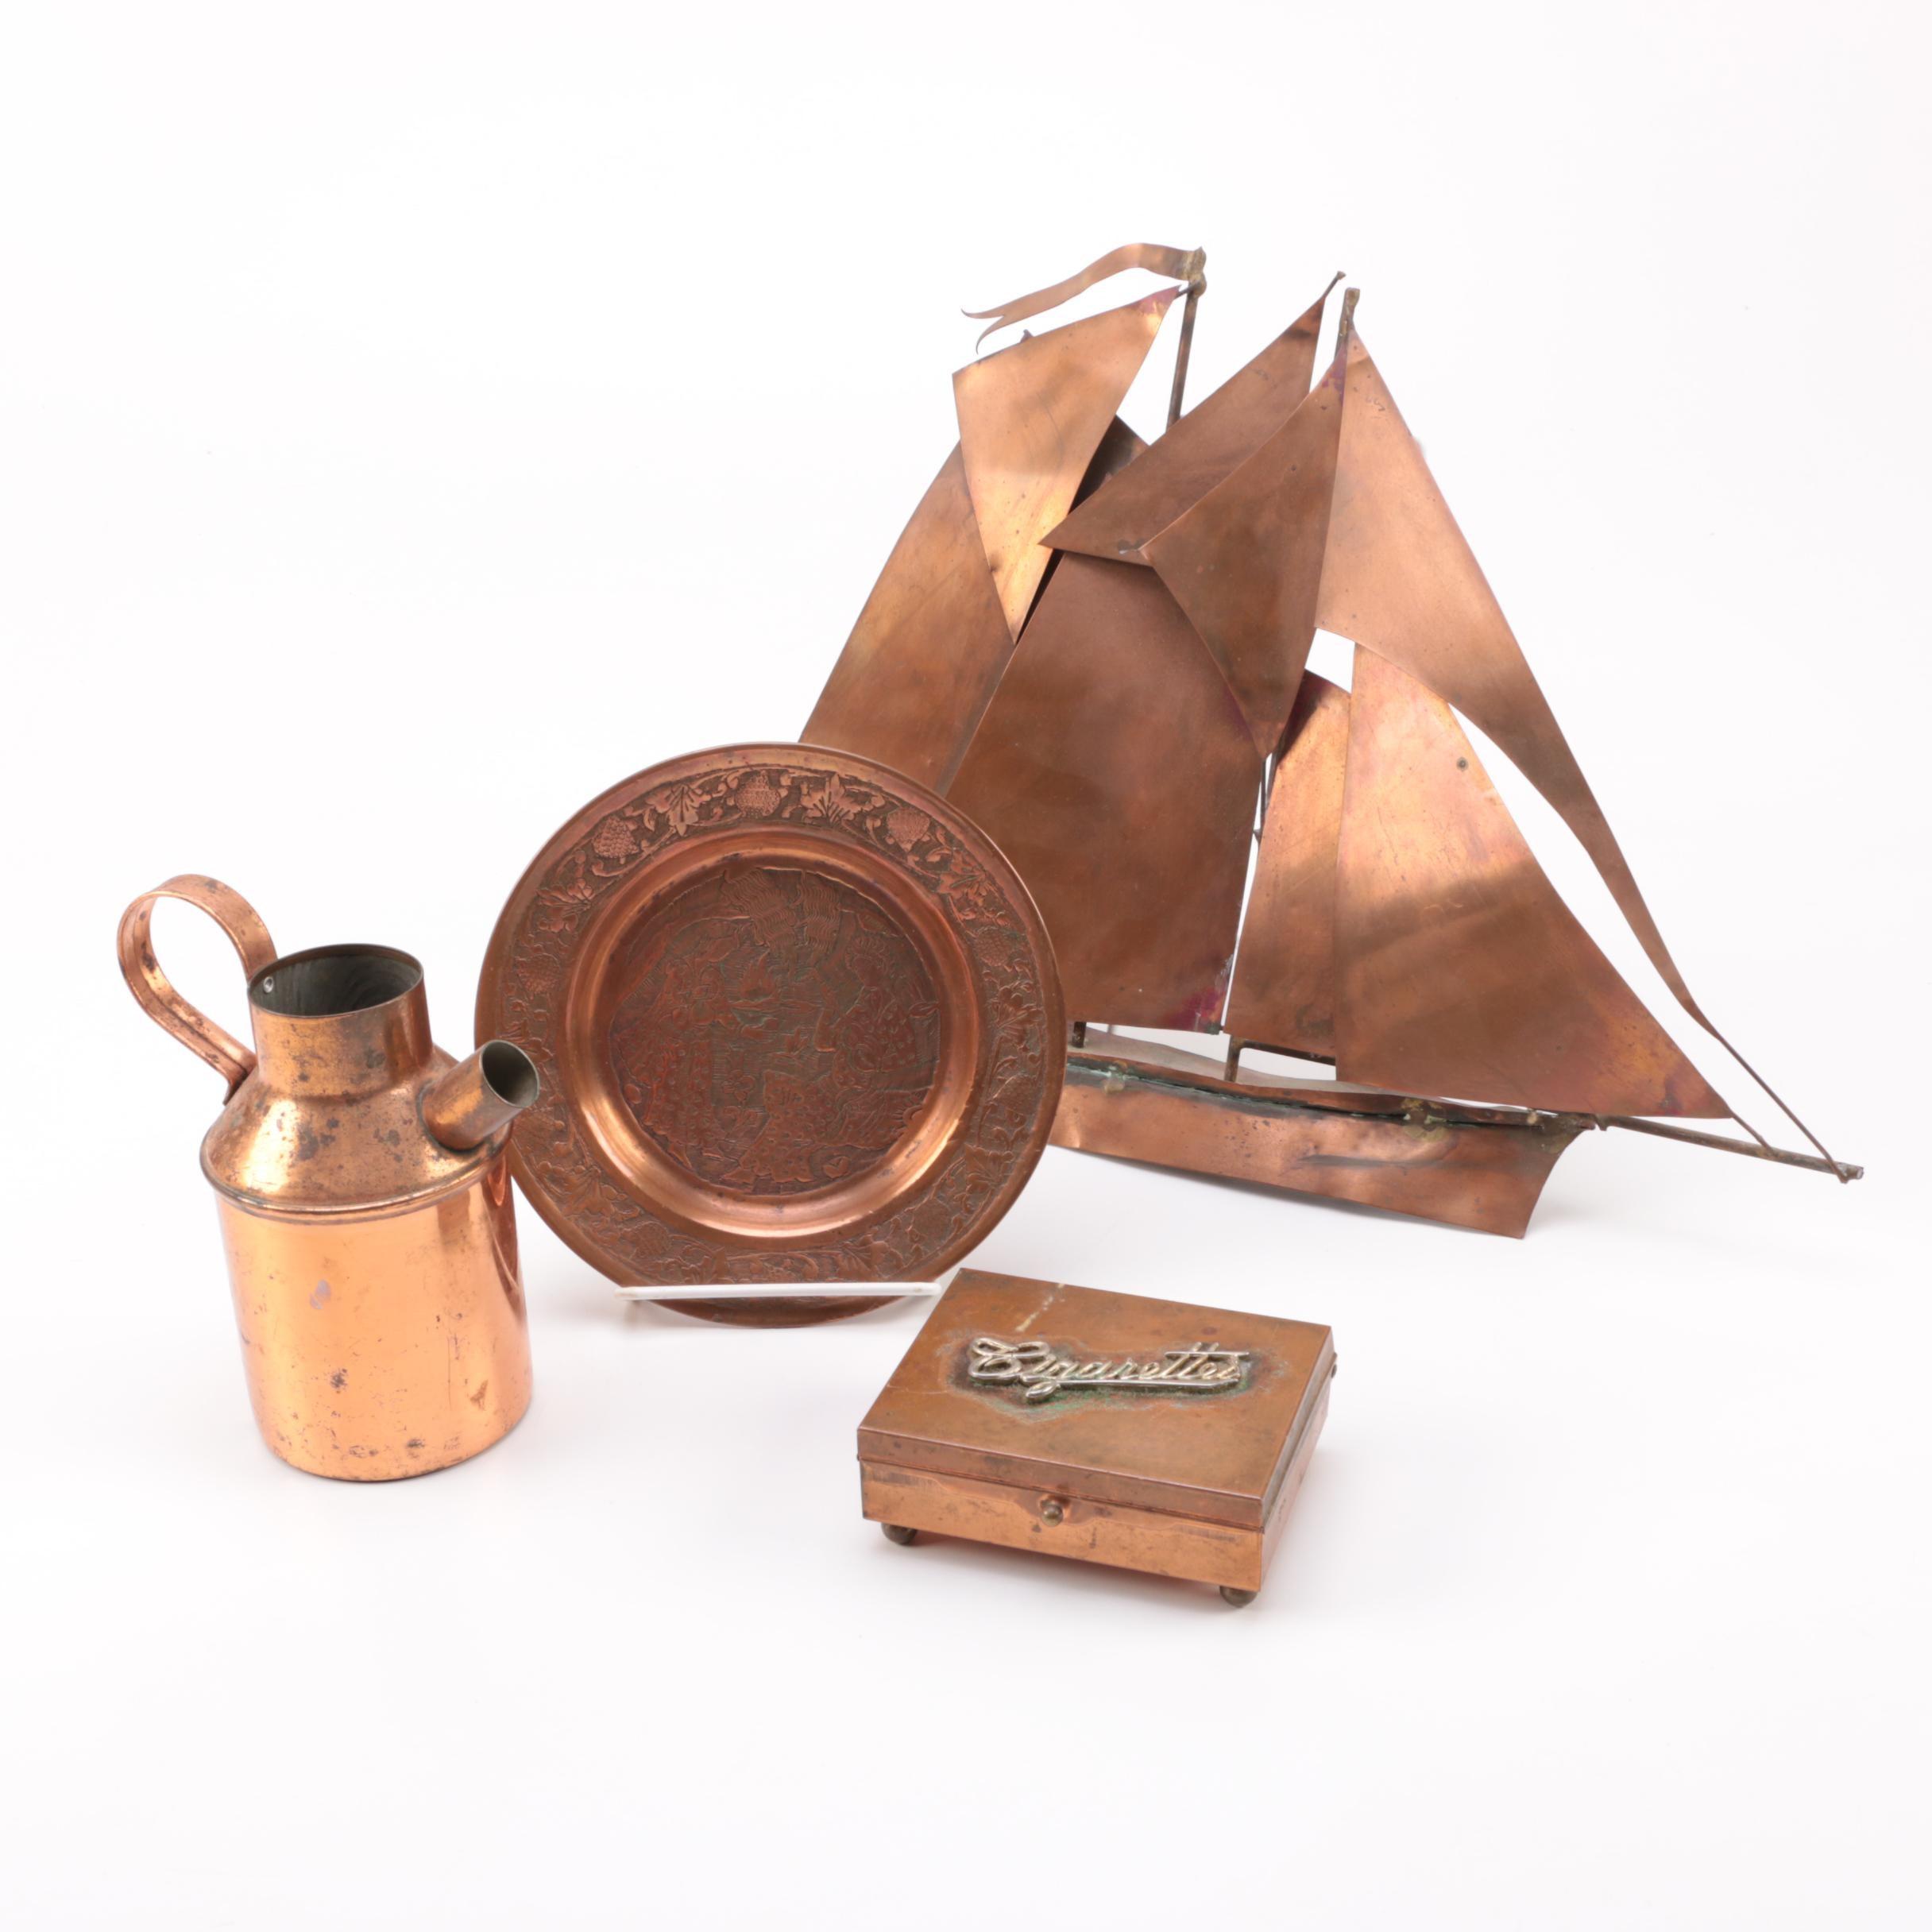 Assortment of Copper Home Decor